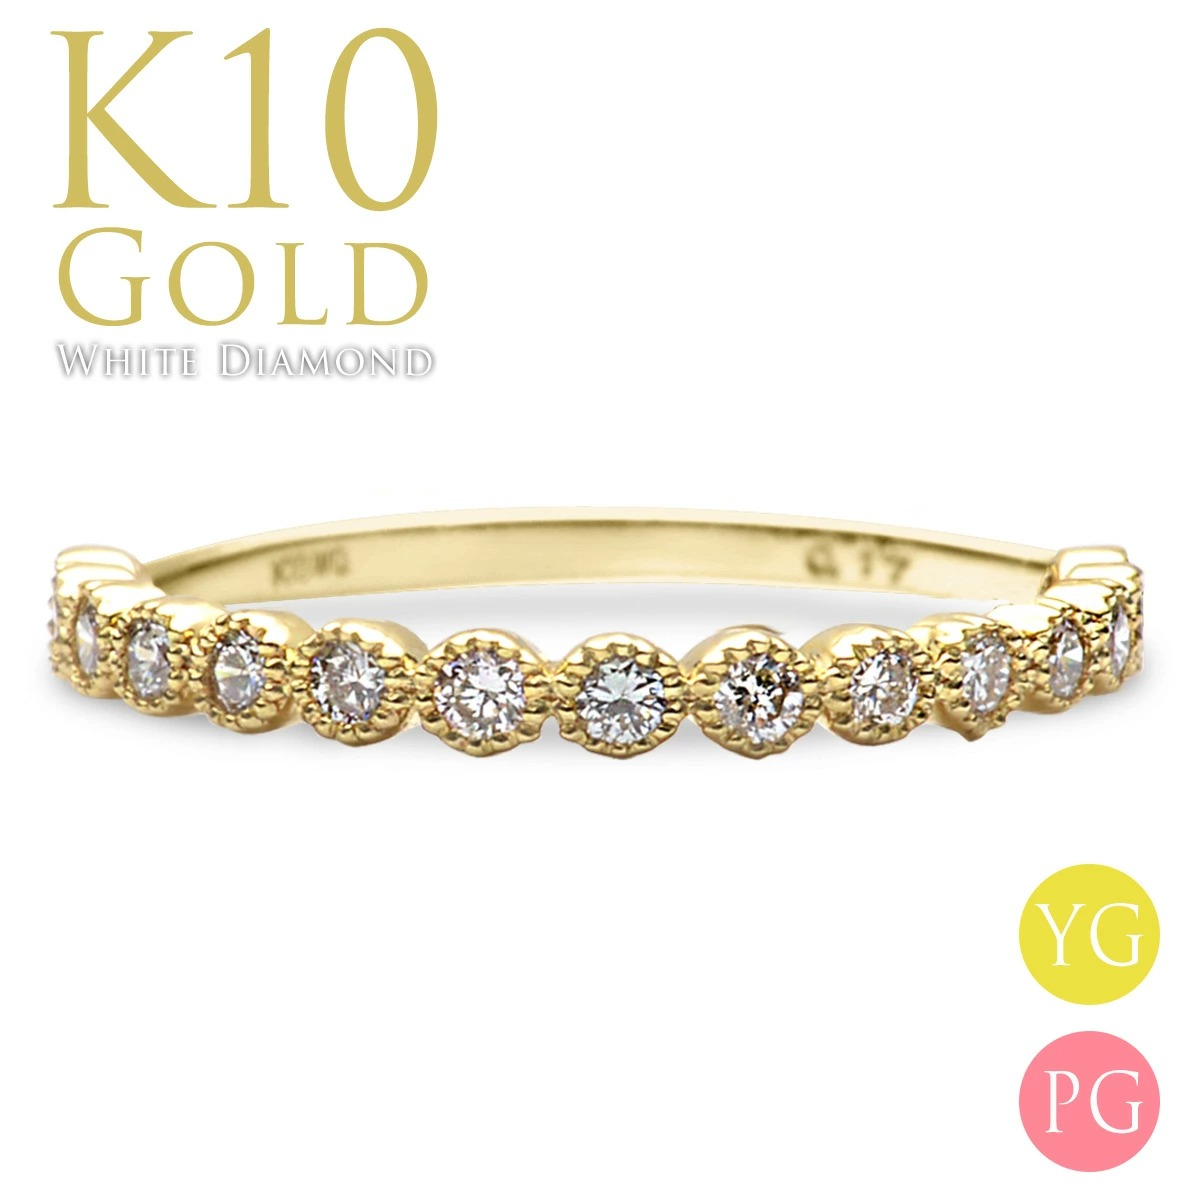 K10 リング 指輪 ホワイトダイヤモンド  ミルグレイン リング RERALUy rri1656k10 新作